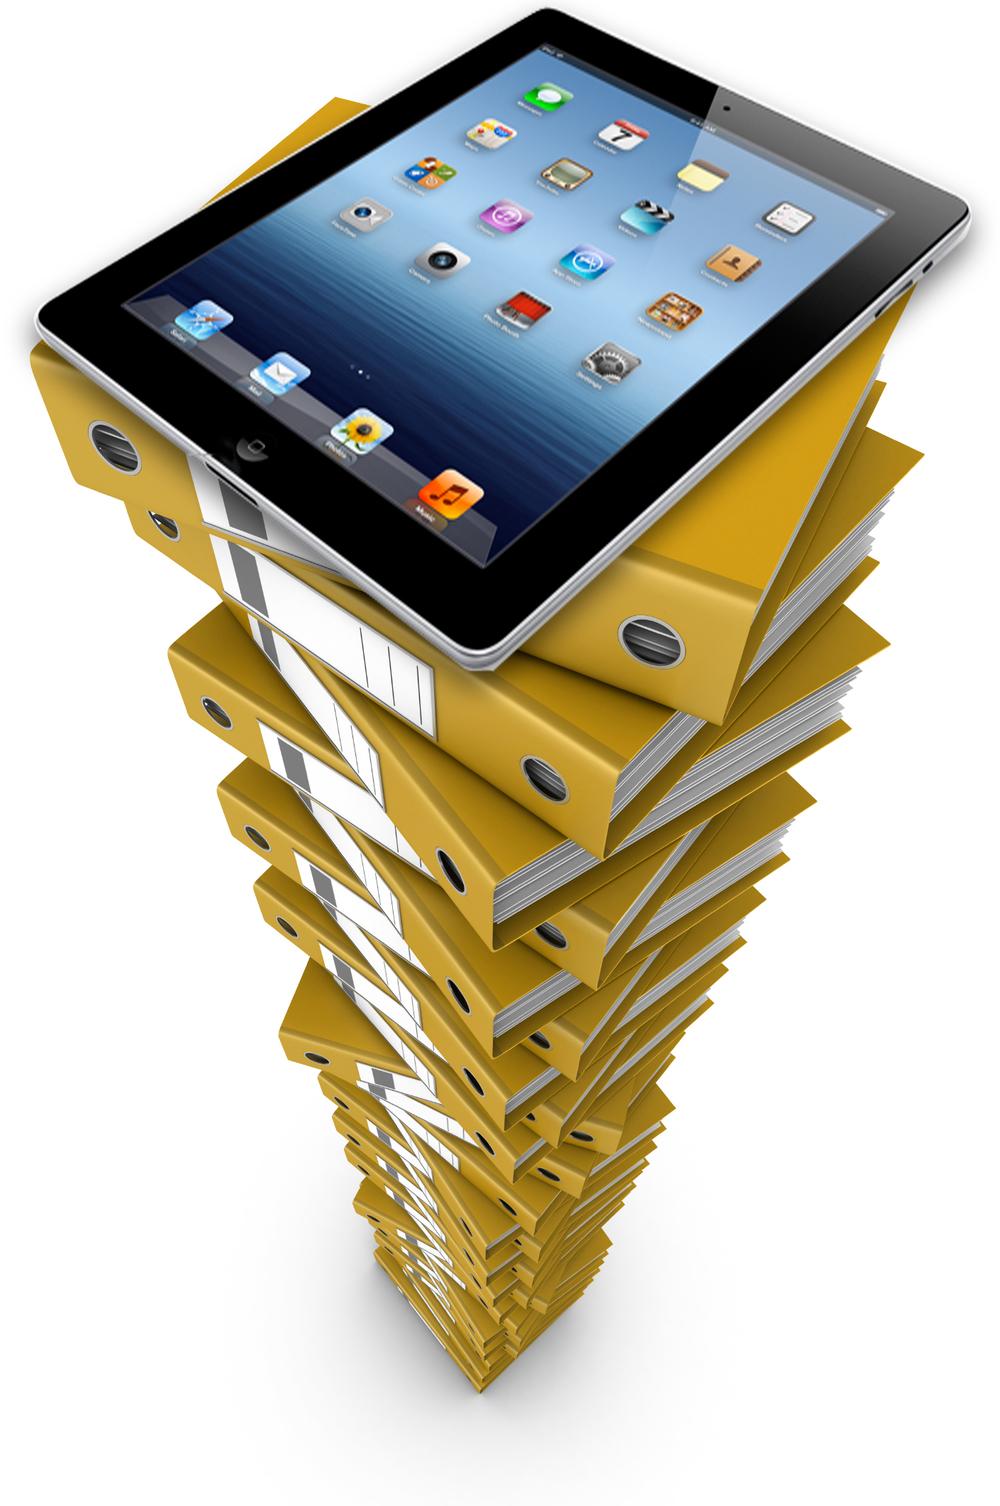 ipad-atop-stack-of-old-training-binders.jpg